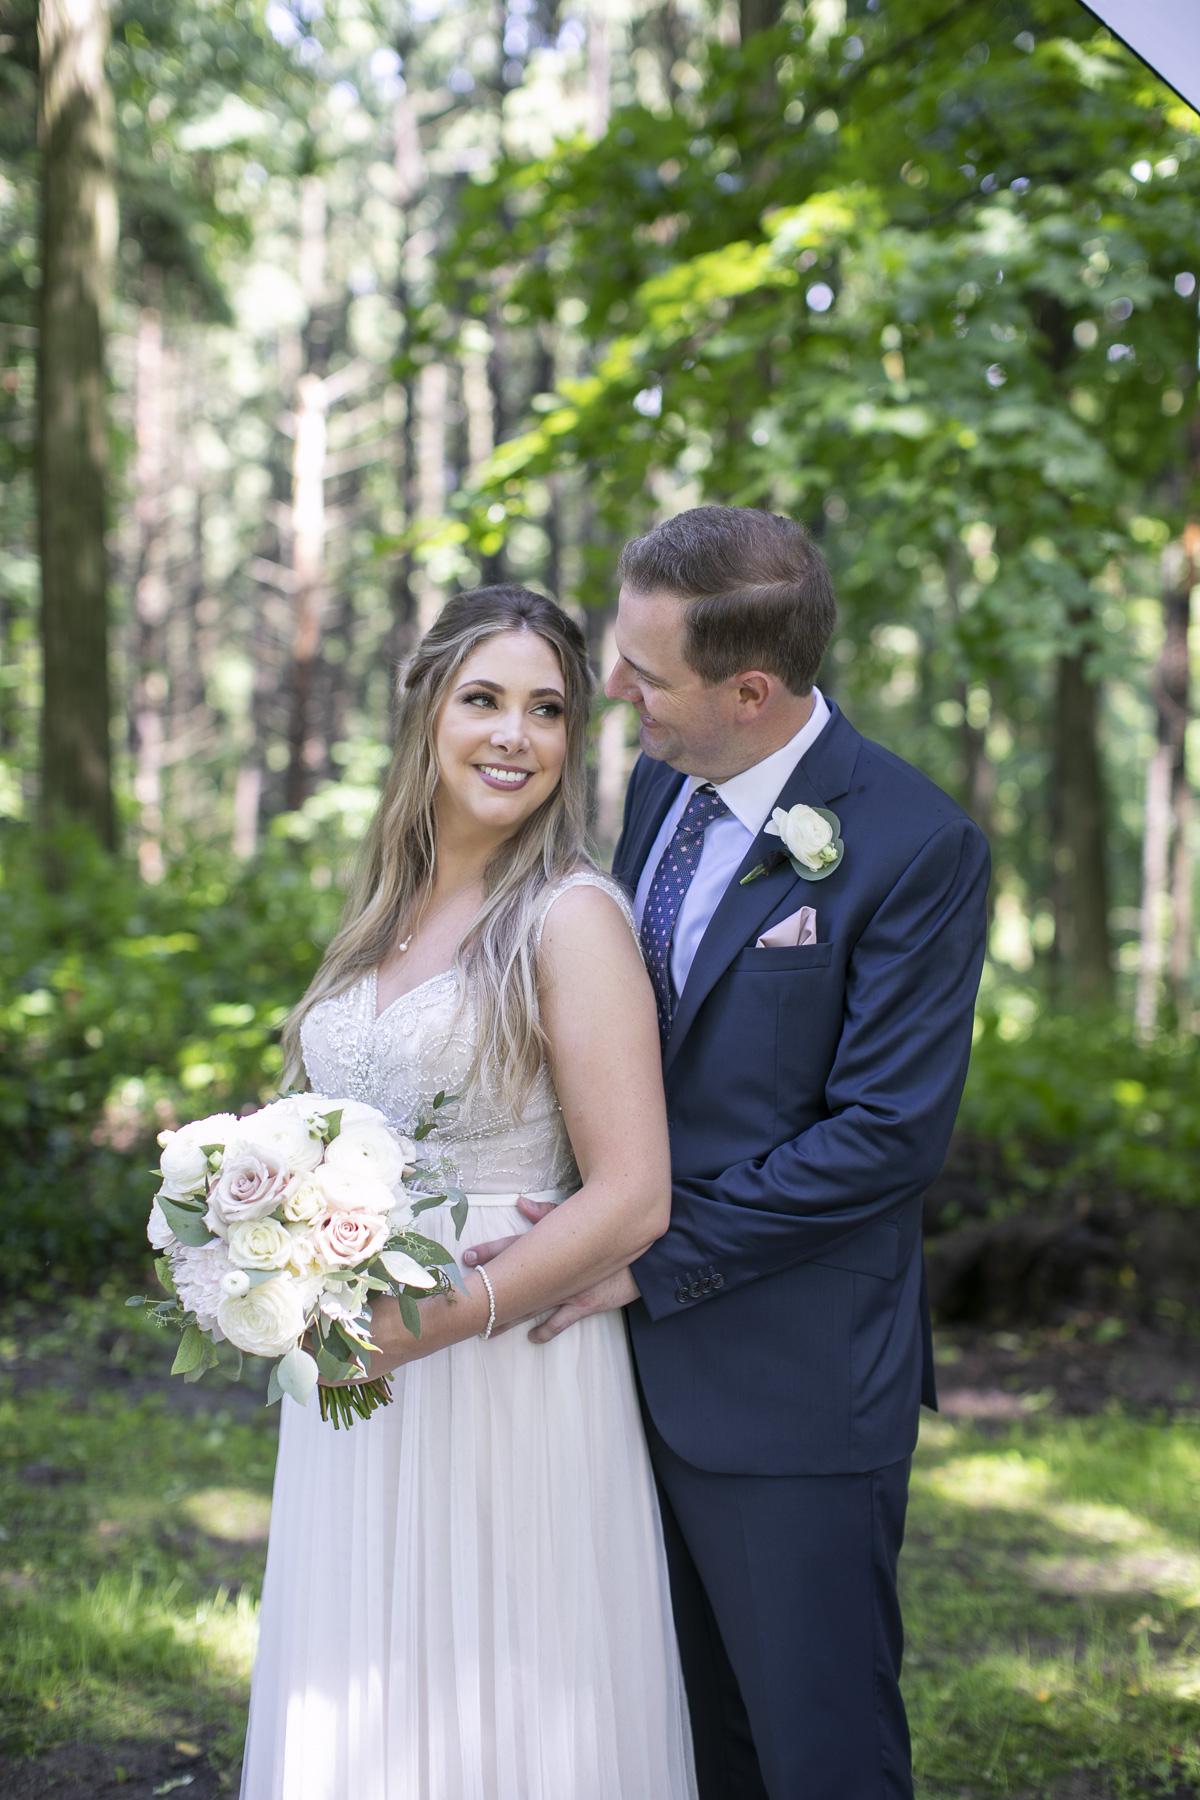 vineyard-bride-philosophy-studios-outdoor-summer-wedding-the-tamahaac-club-niagara-ancaster-toronto-vendor-0062.JPG